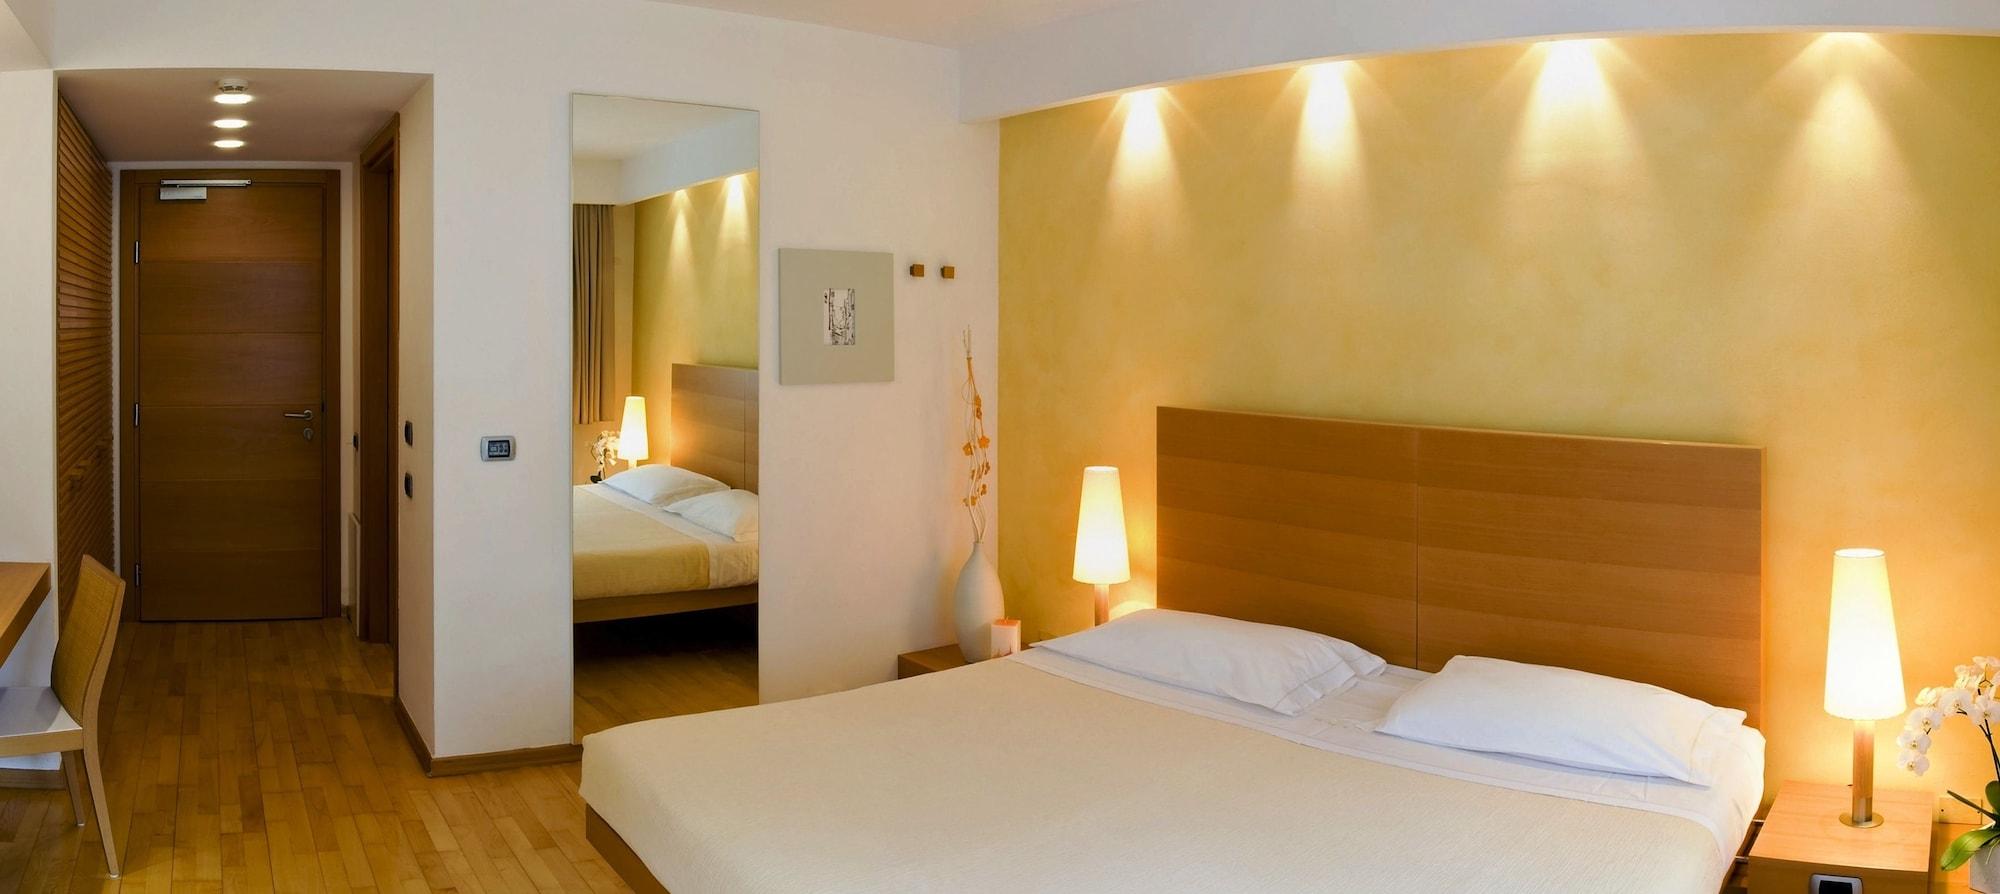 Grand Hotel Terme, Trento